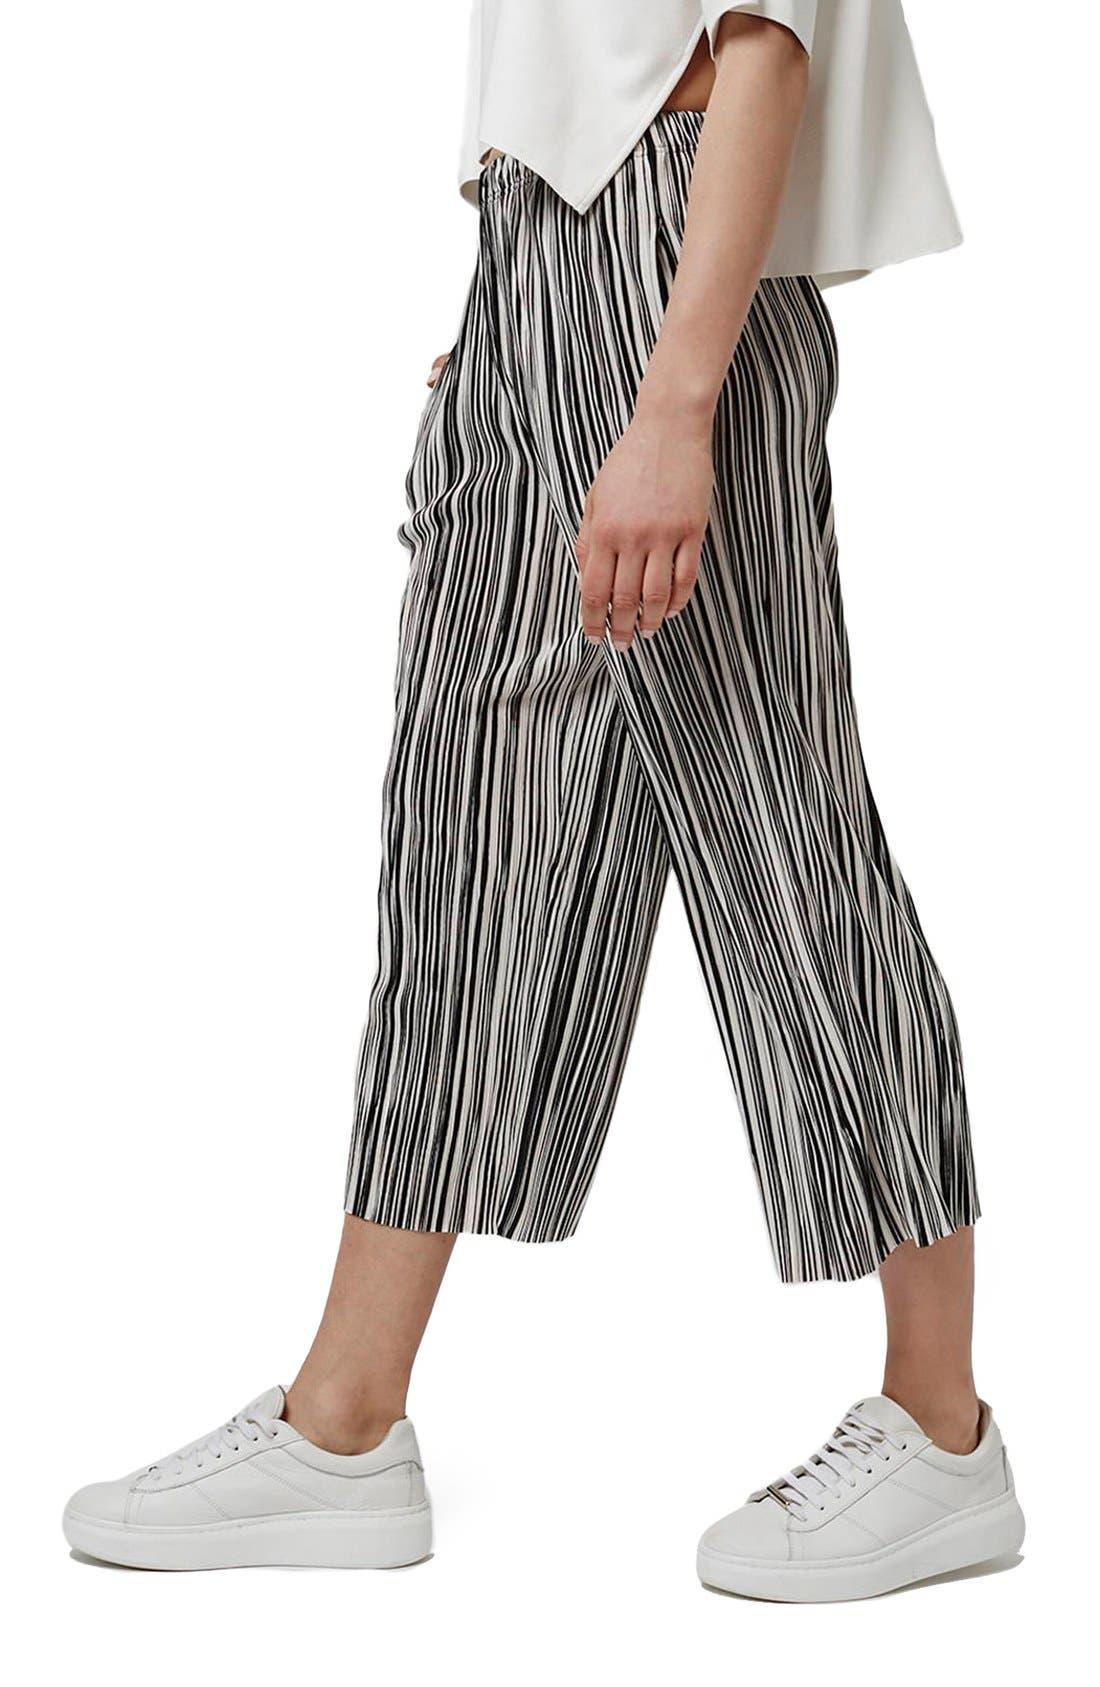 Main Image - Topshop Pleat Stripe Crop Trousers (Petite)